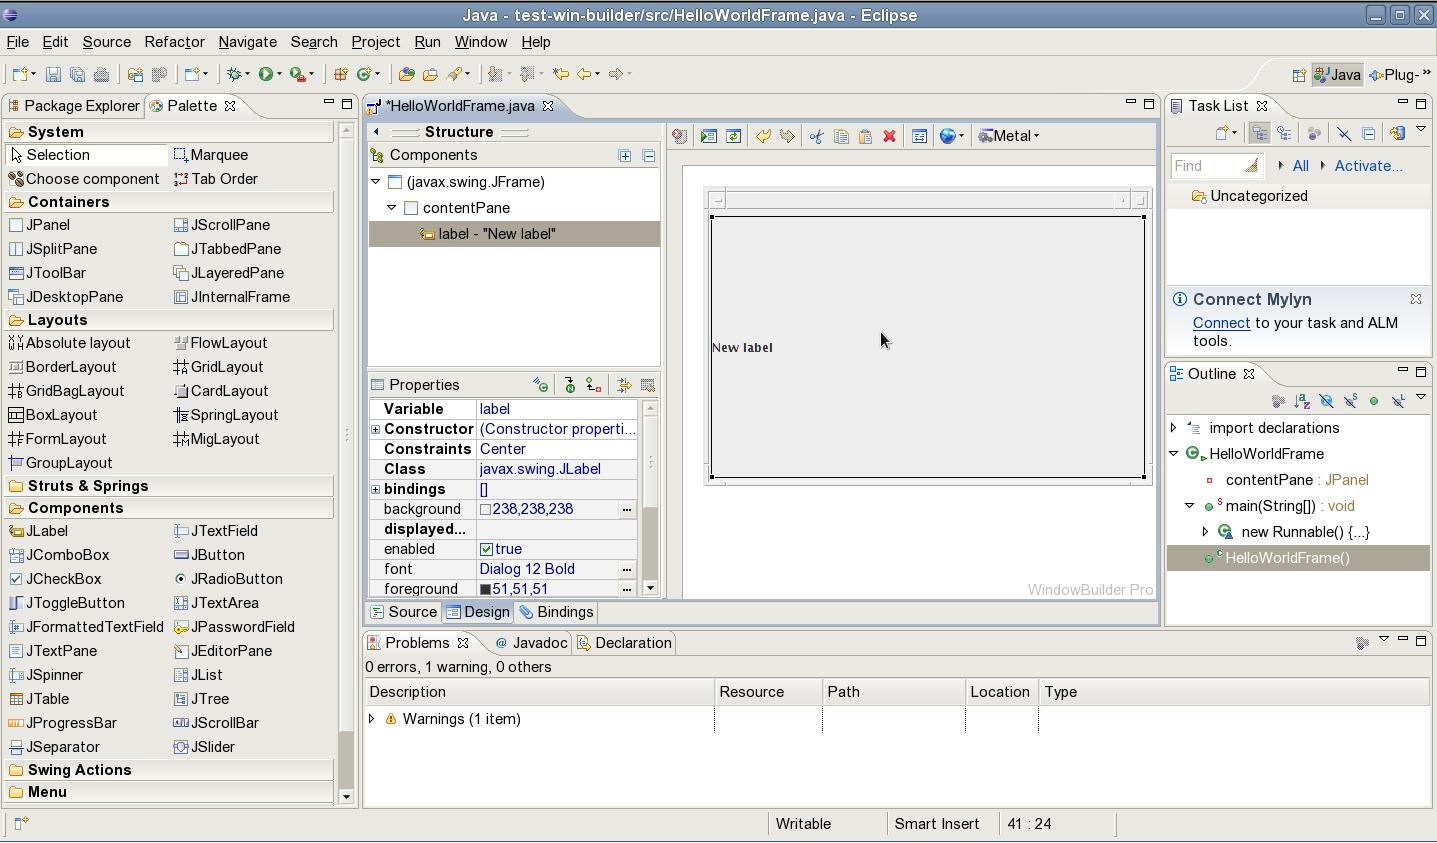 jcafe info: WindowBuilder Pro, Hello World Java Swing